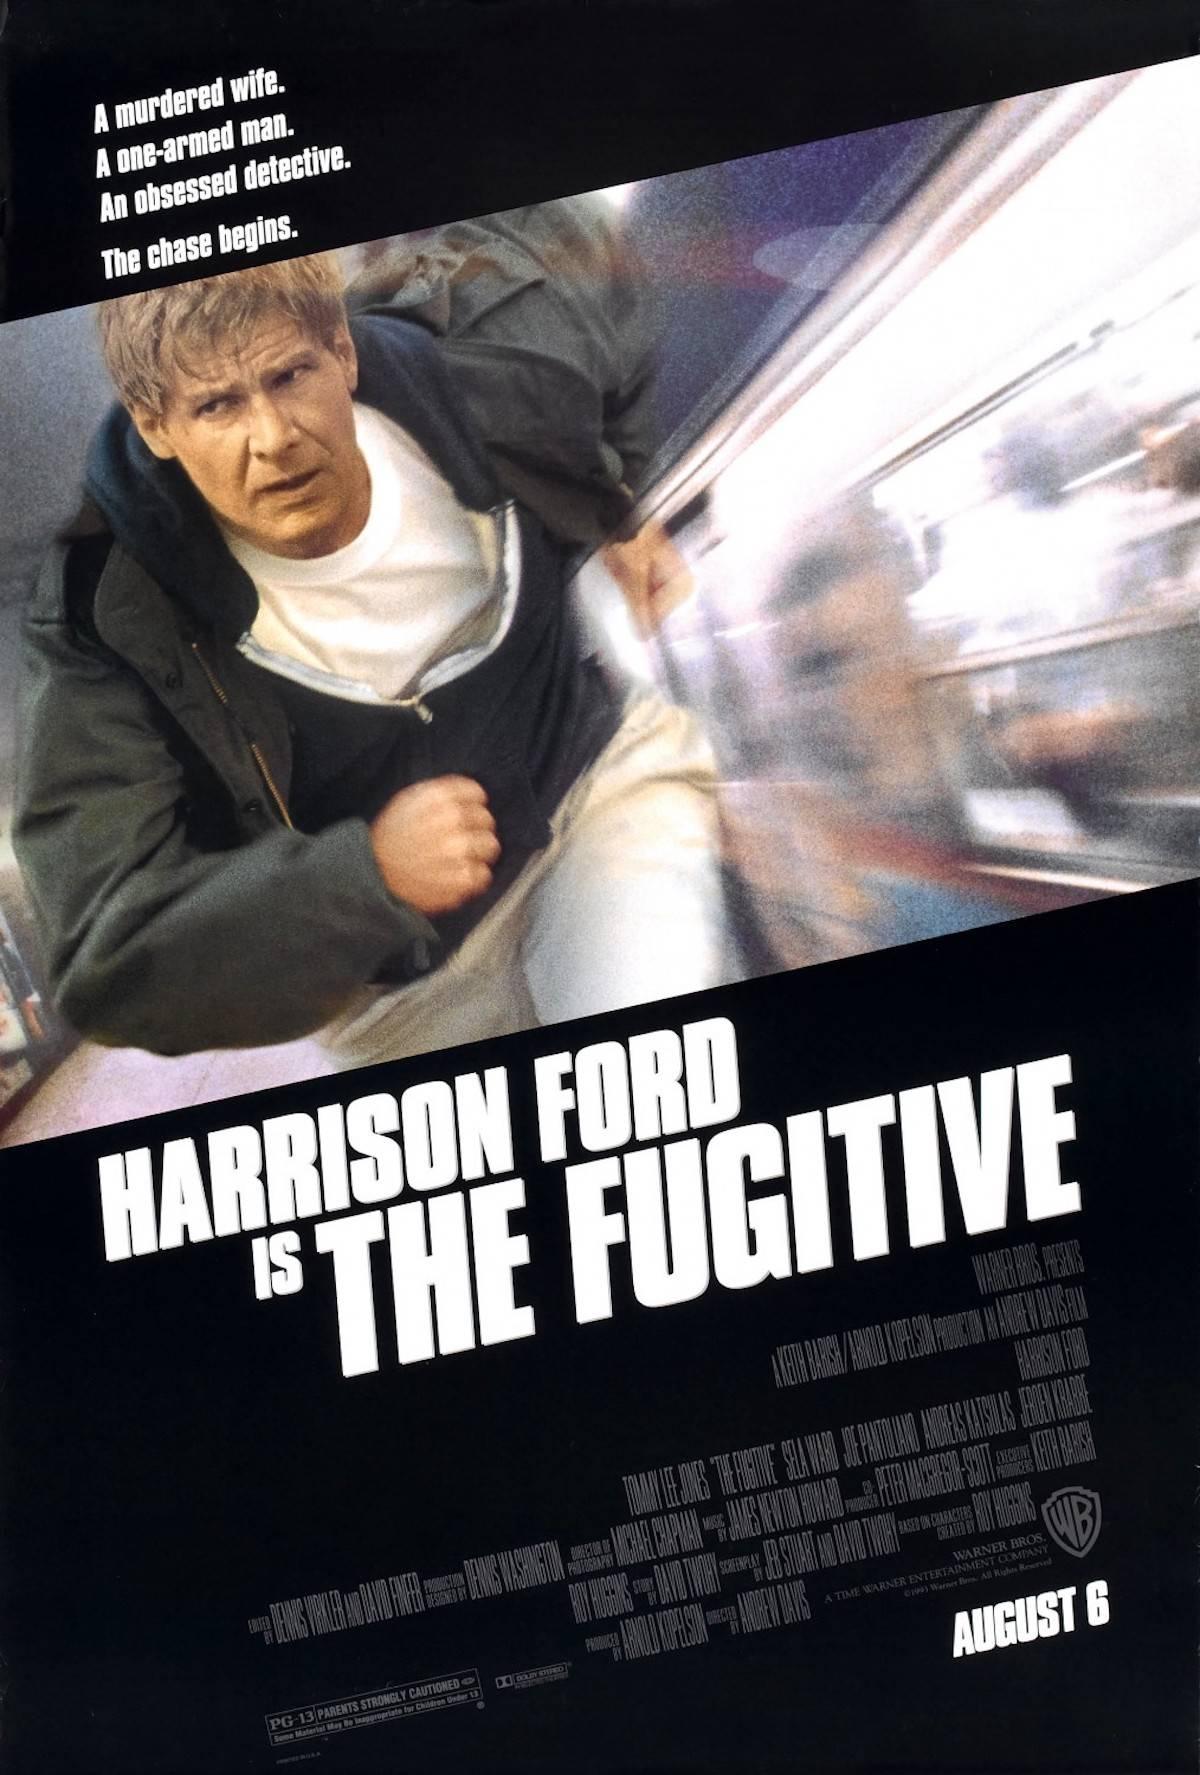 le-fugitif-un-film-qui-sinscrit-dans-la-grande-tradition-des-films-hitchcockiens